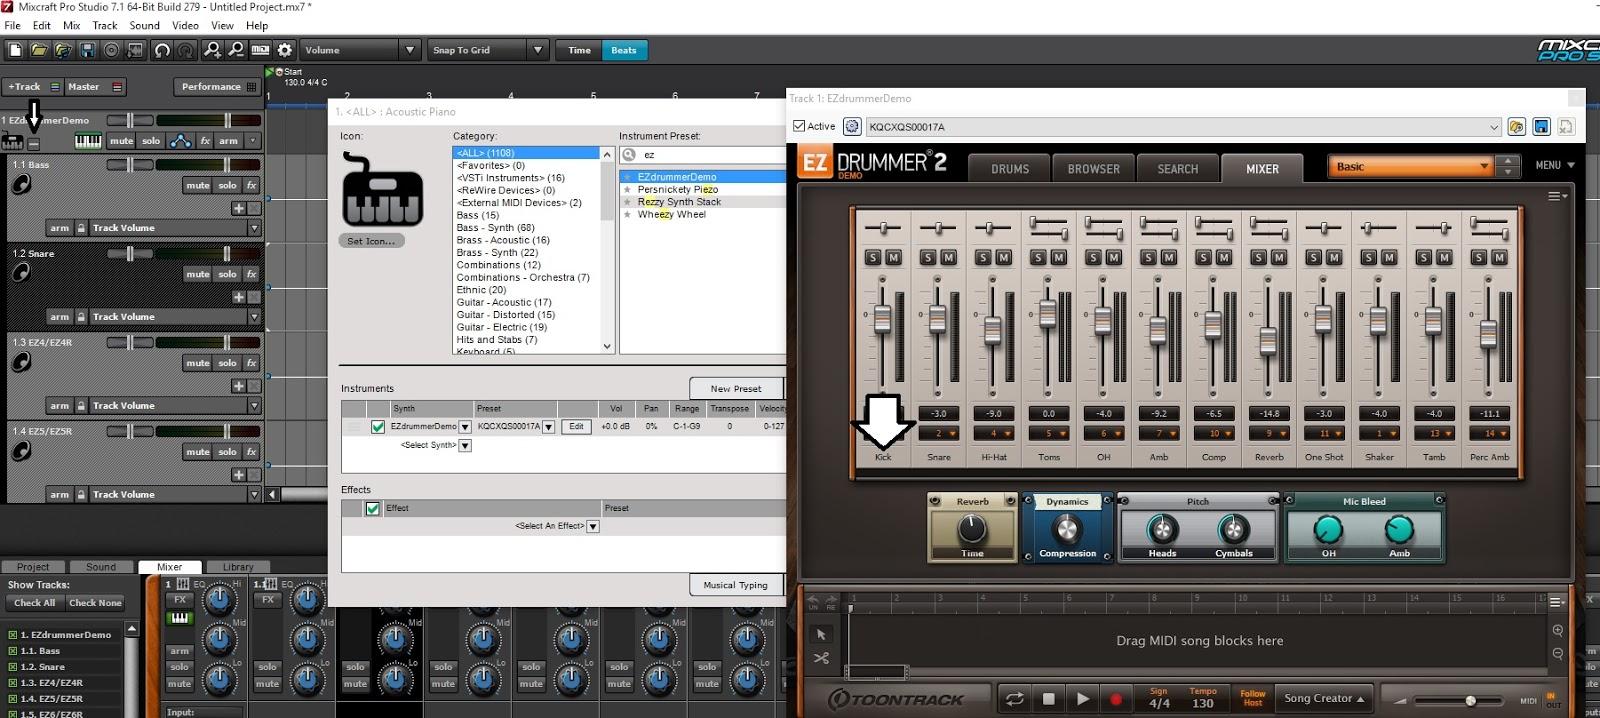 Me 'n' Music: How to 'ReWire' Ezdrummer in Mixcraft 7 Pro Studio